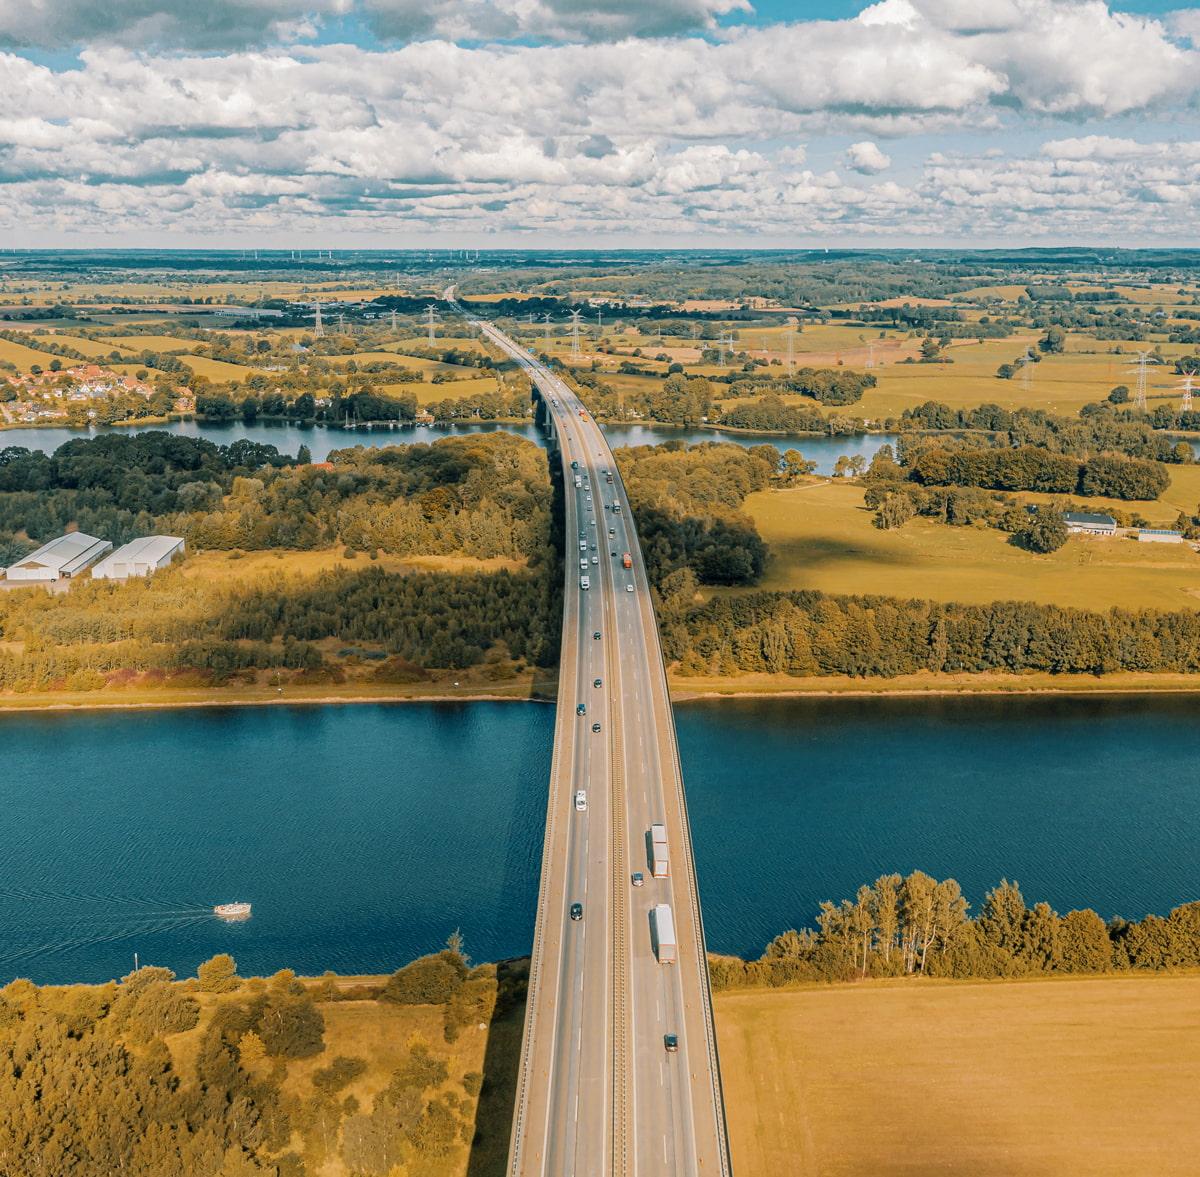 A7 Autobahn, Germany